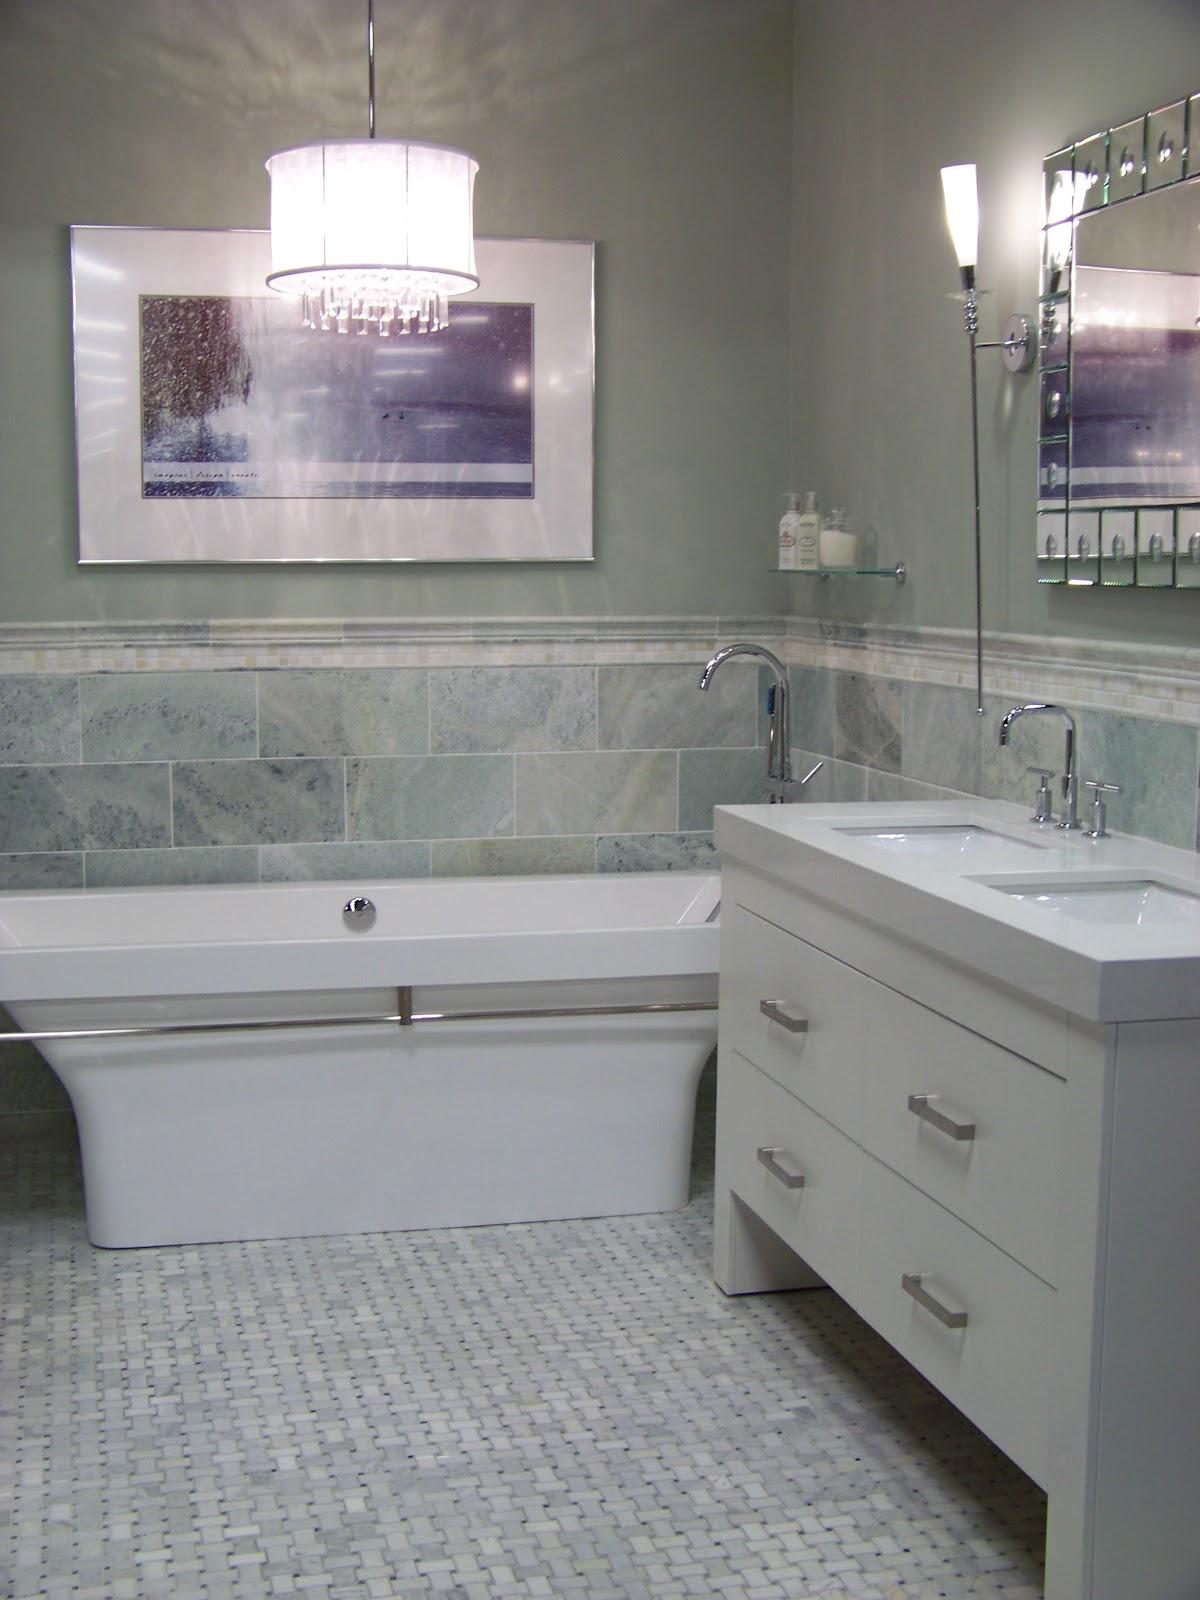 Home Decor Budgetista Bathroom Inspiration The Tile Shop - Carrara gris porcelain tile